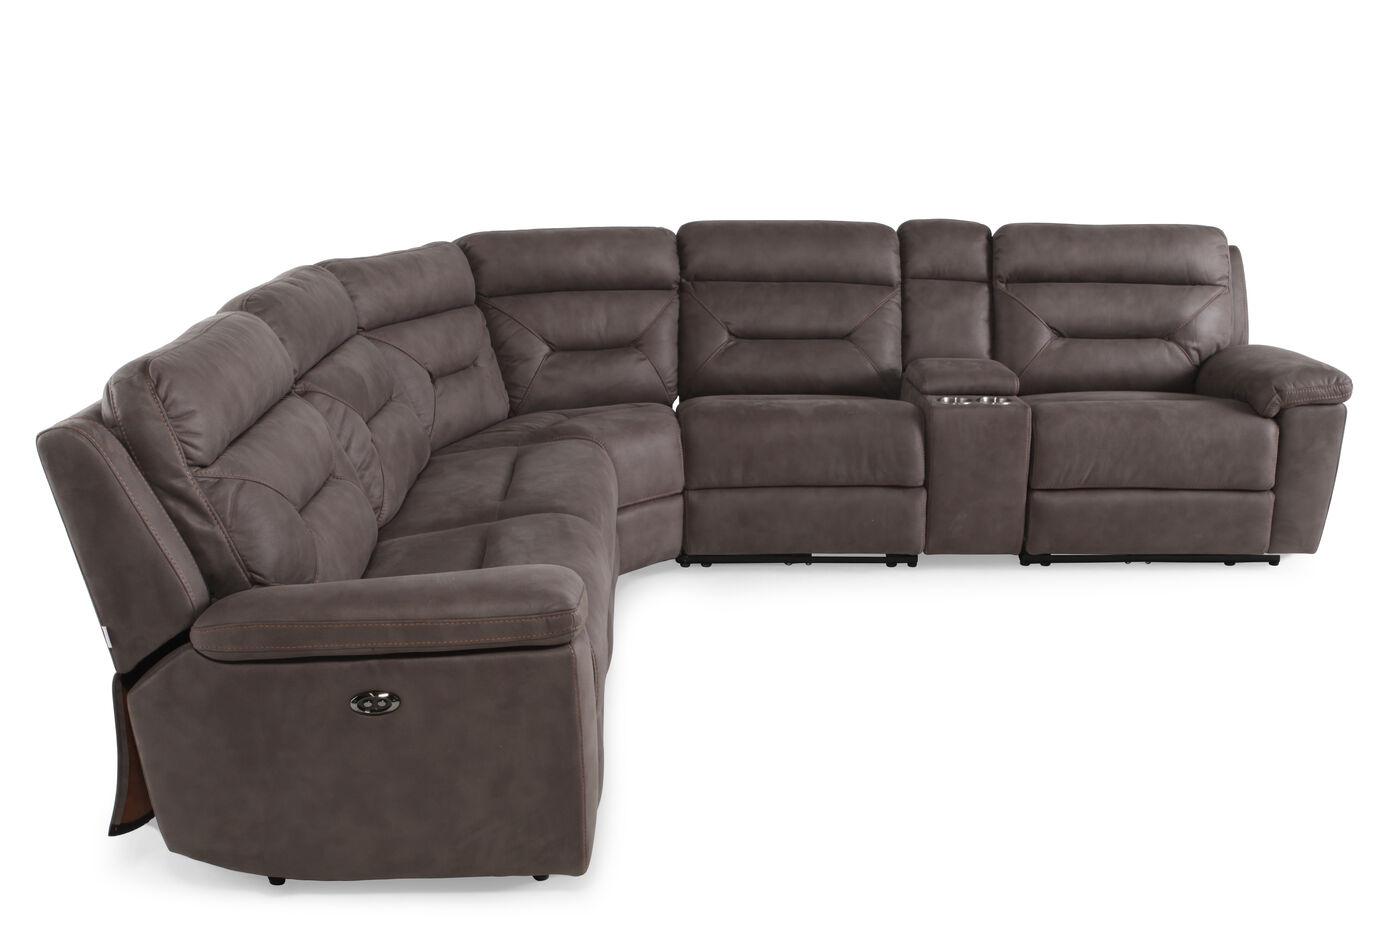 Six piece microfiber 168quot power reclining sectional in for 6 piece microfiber sectional sofa